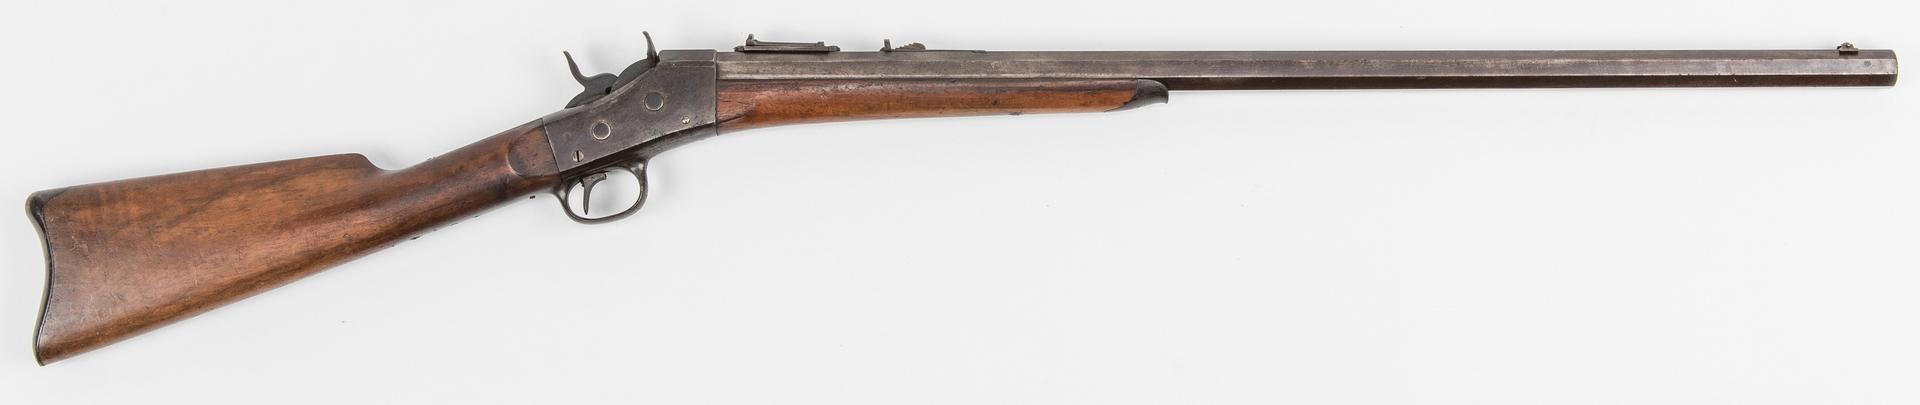 Lot 788 Remington Rolling Block Single Shot Rifle 42 Cal